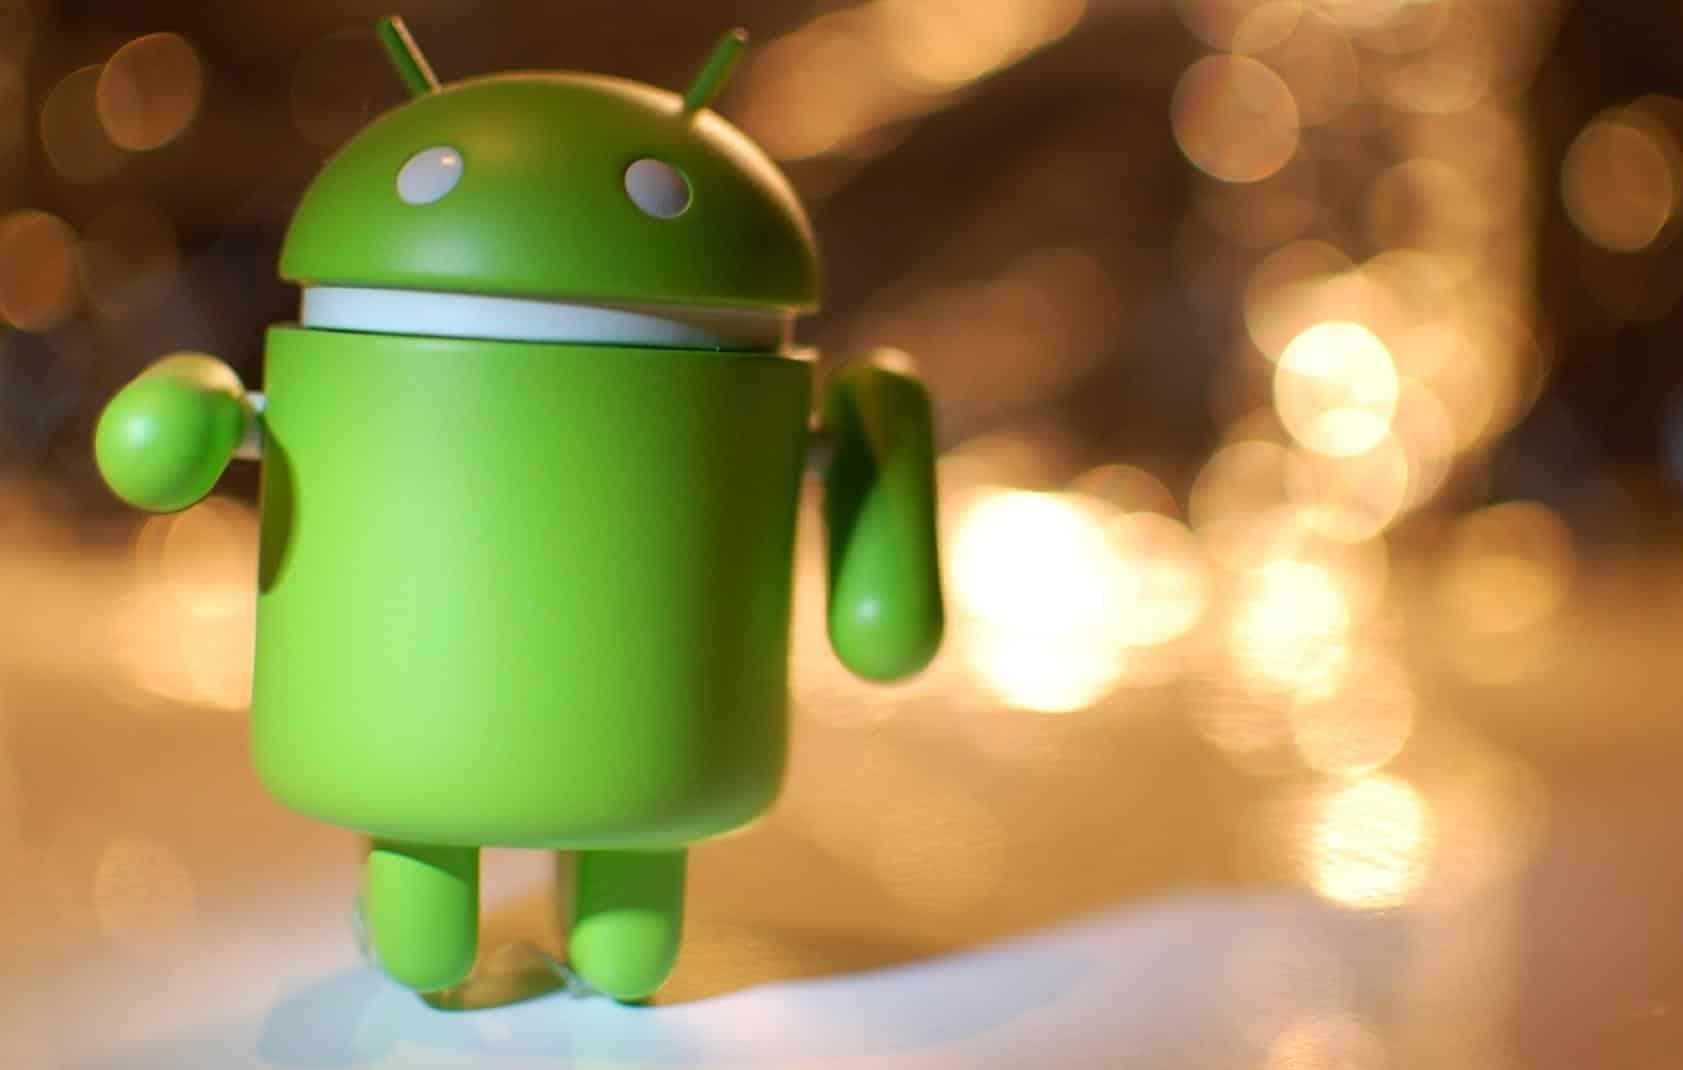 SVM Tecnologia | 28 aplicativos e jogos para Android que